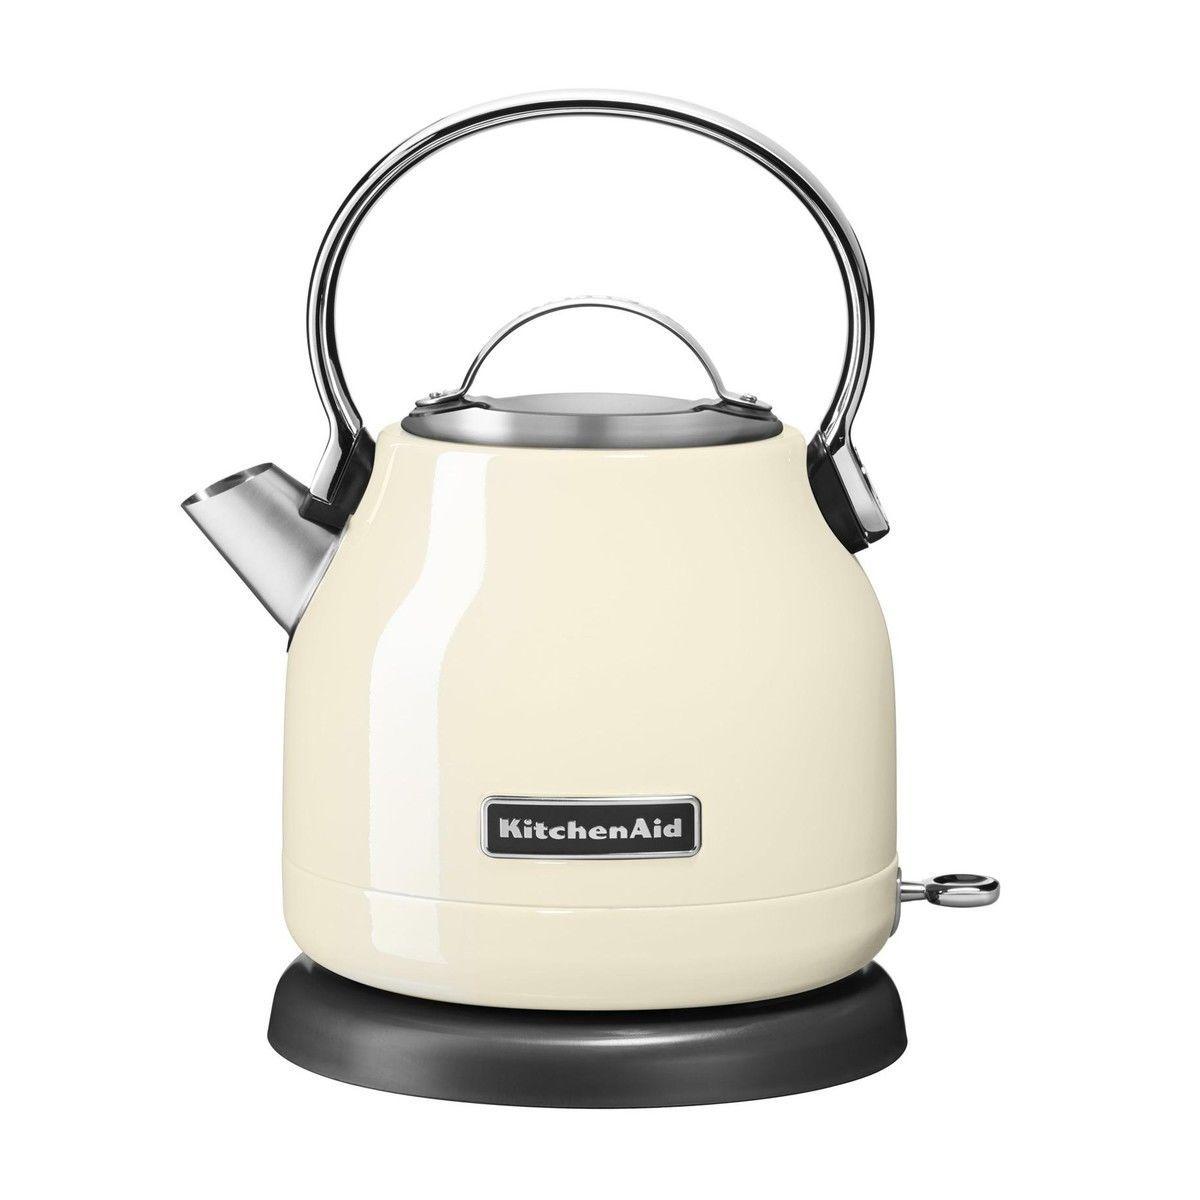 Kitchenaid Electric Kettle ~ Kek electric kettle l kitchenaid